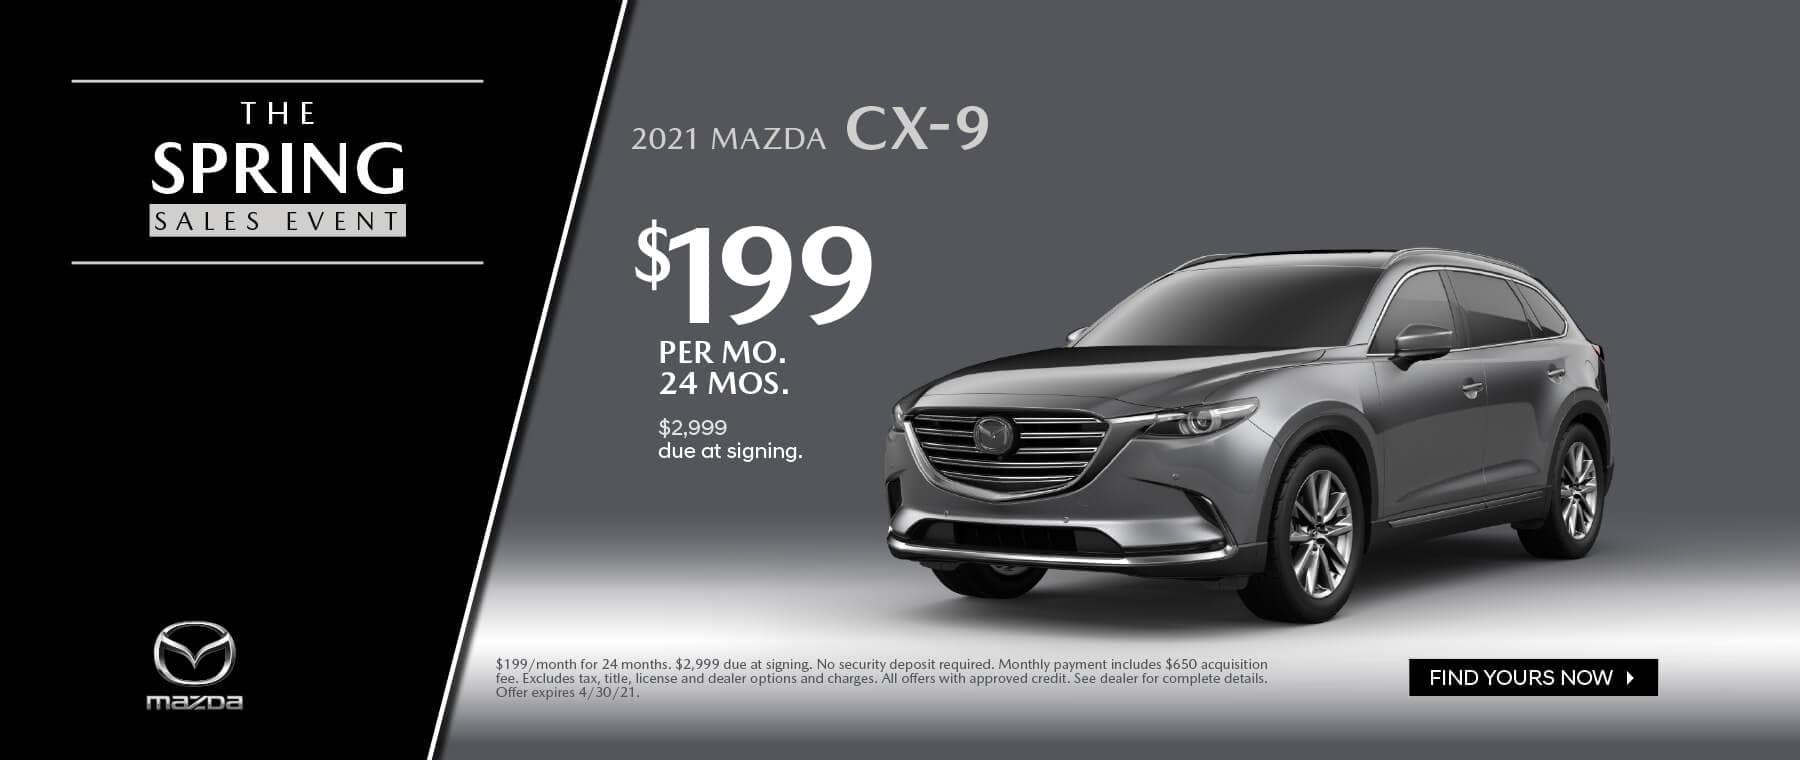 2021.04.15-Keffer-Mazda-APR-Web-Banner-Offer-Update-S51838vw-4